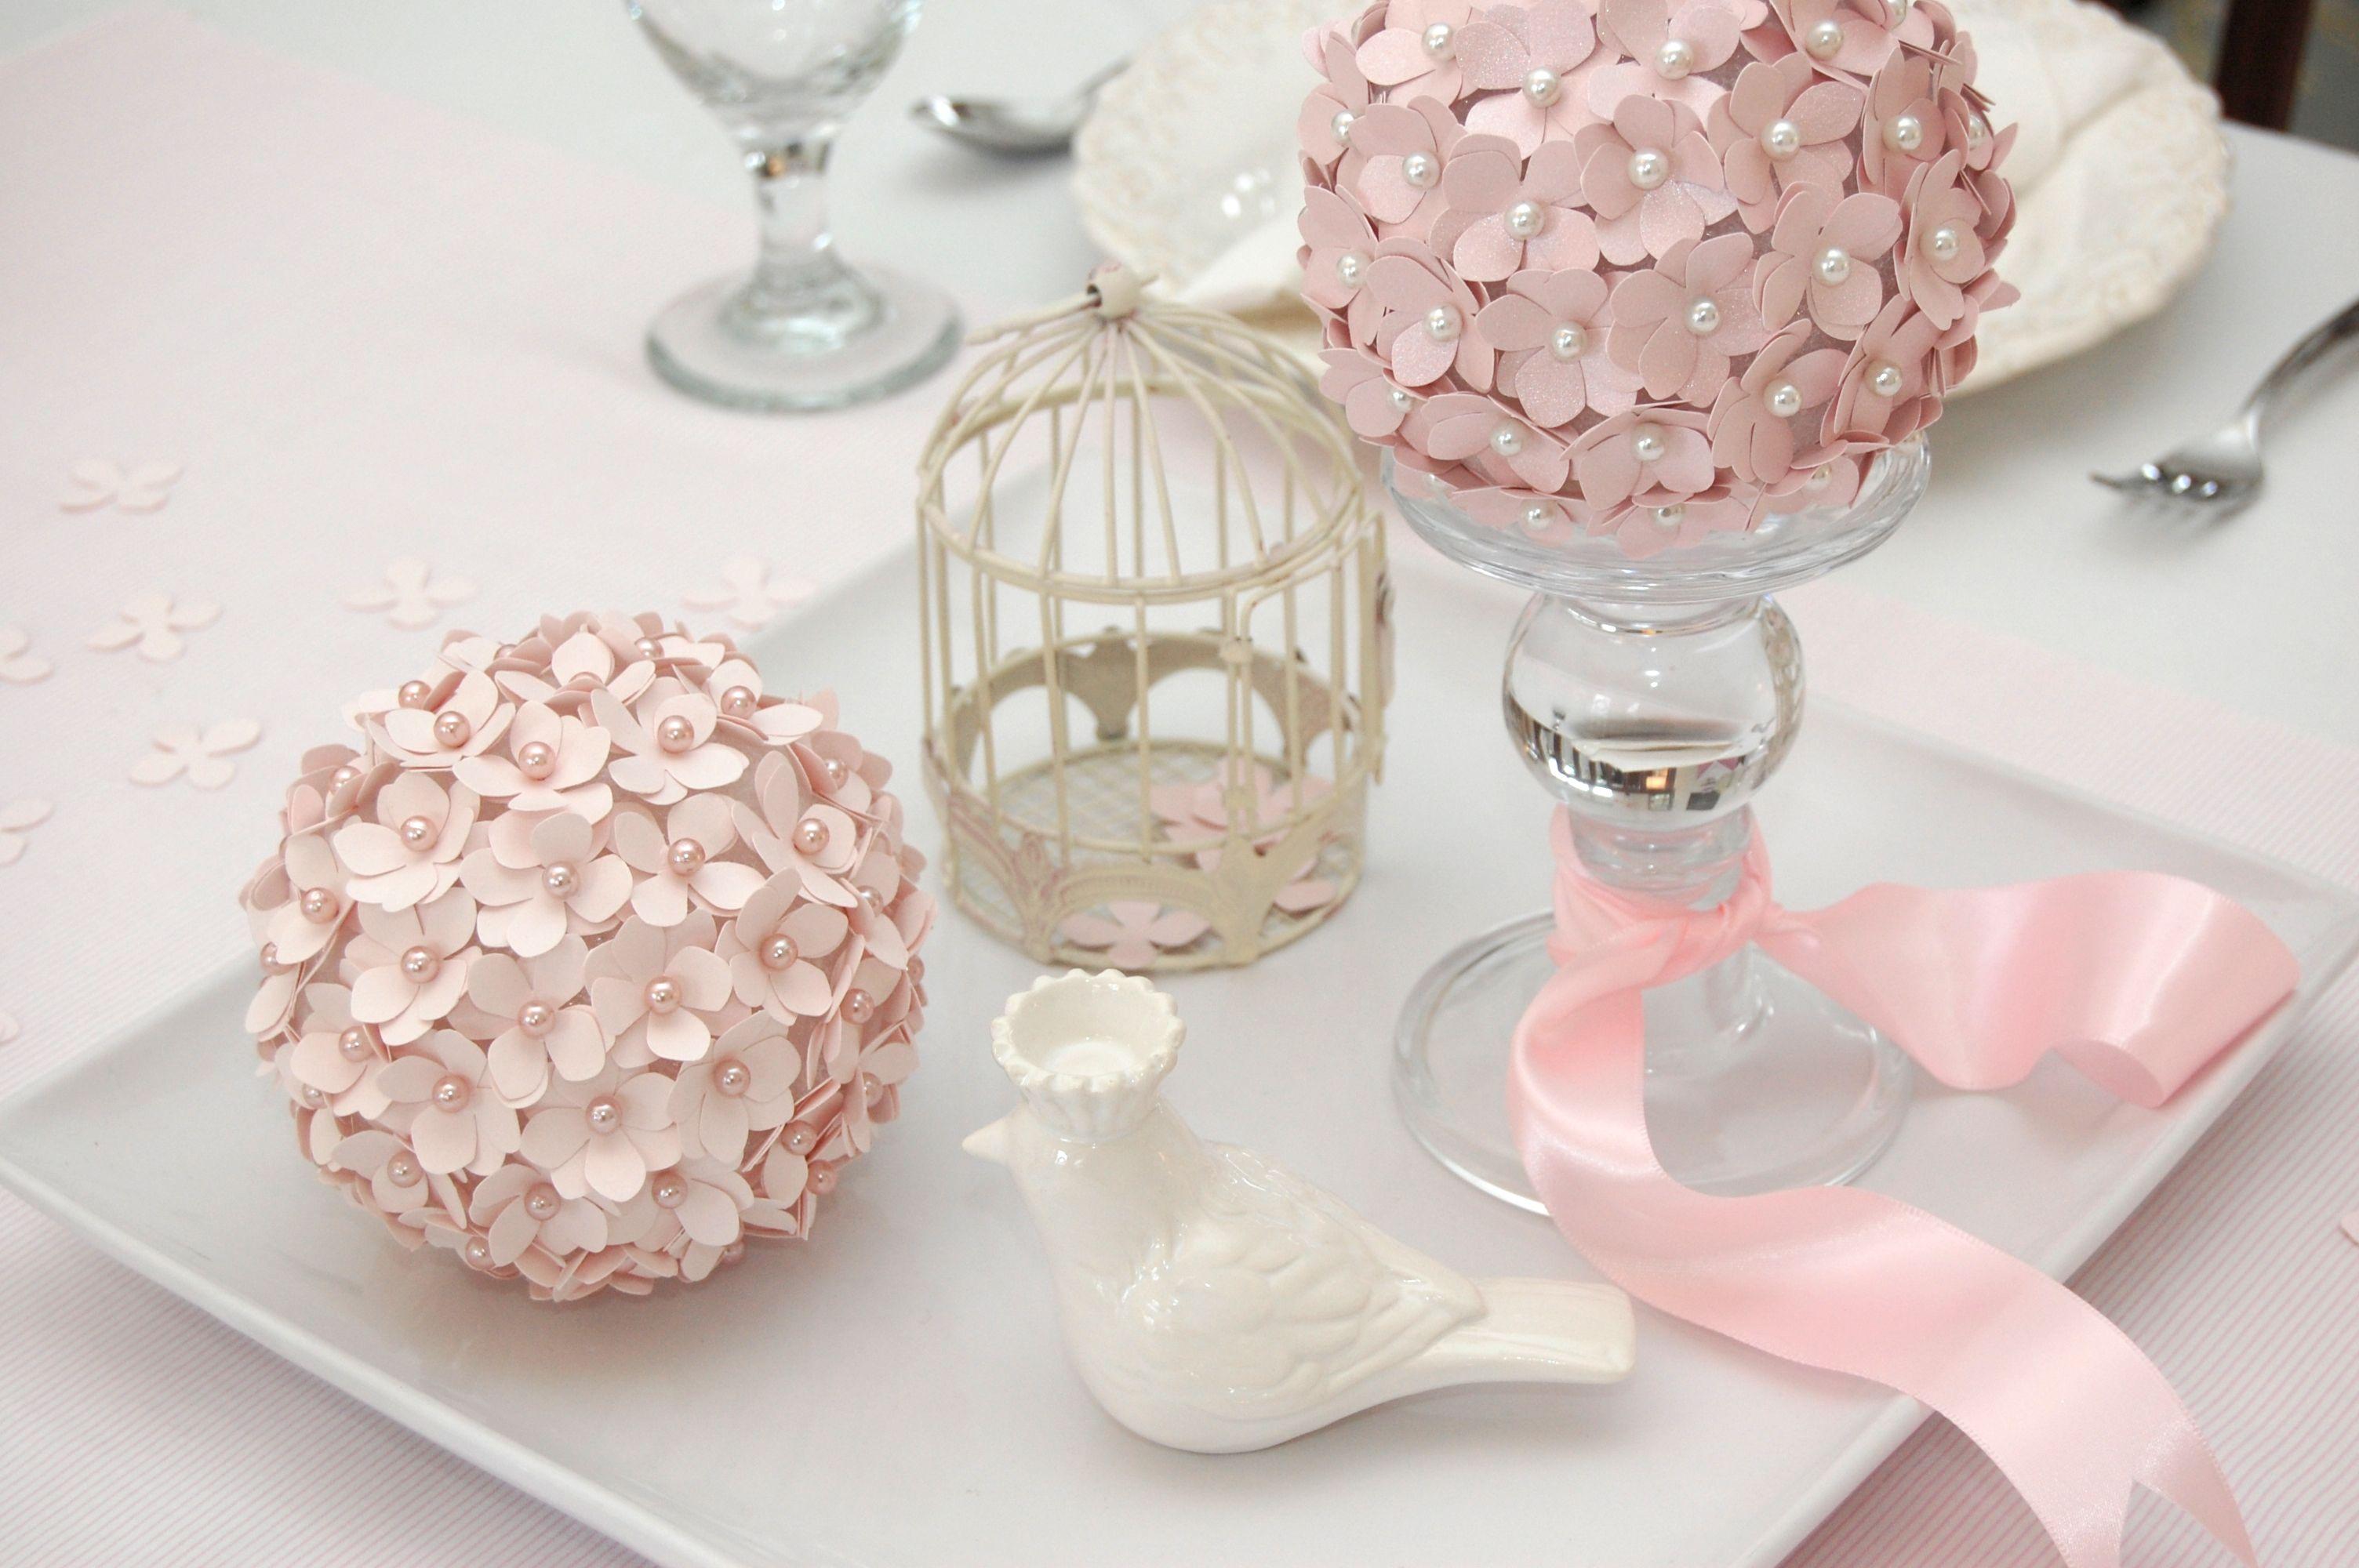 how to make paper flower centerpieces - Maggi.locustdesign.co